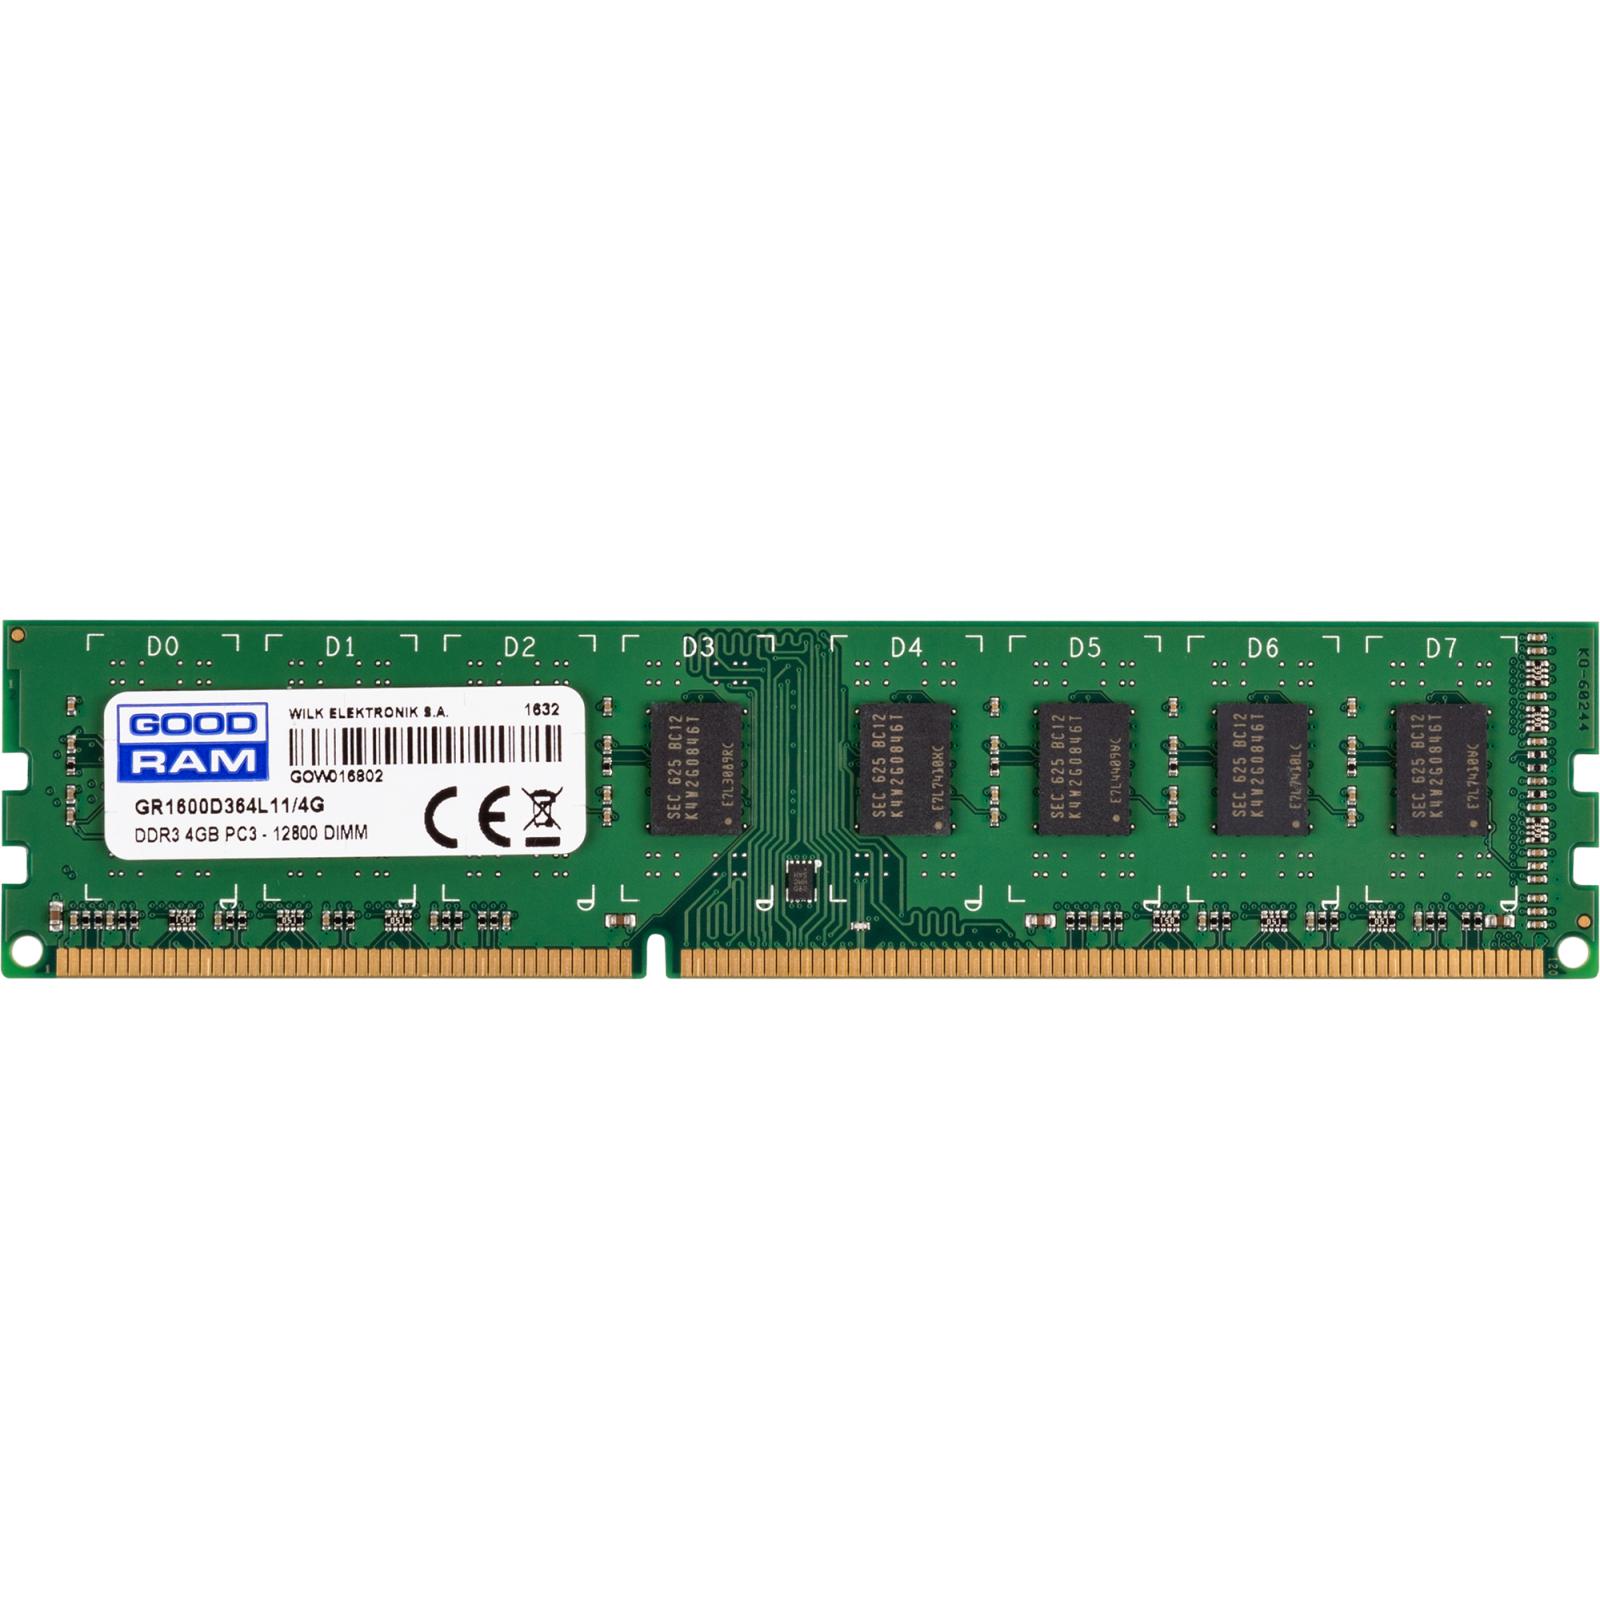 Модуль памяти для компьютера DDR3 4GB 1600 MHz GOODRAM (GR1600D364L11/4G)